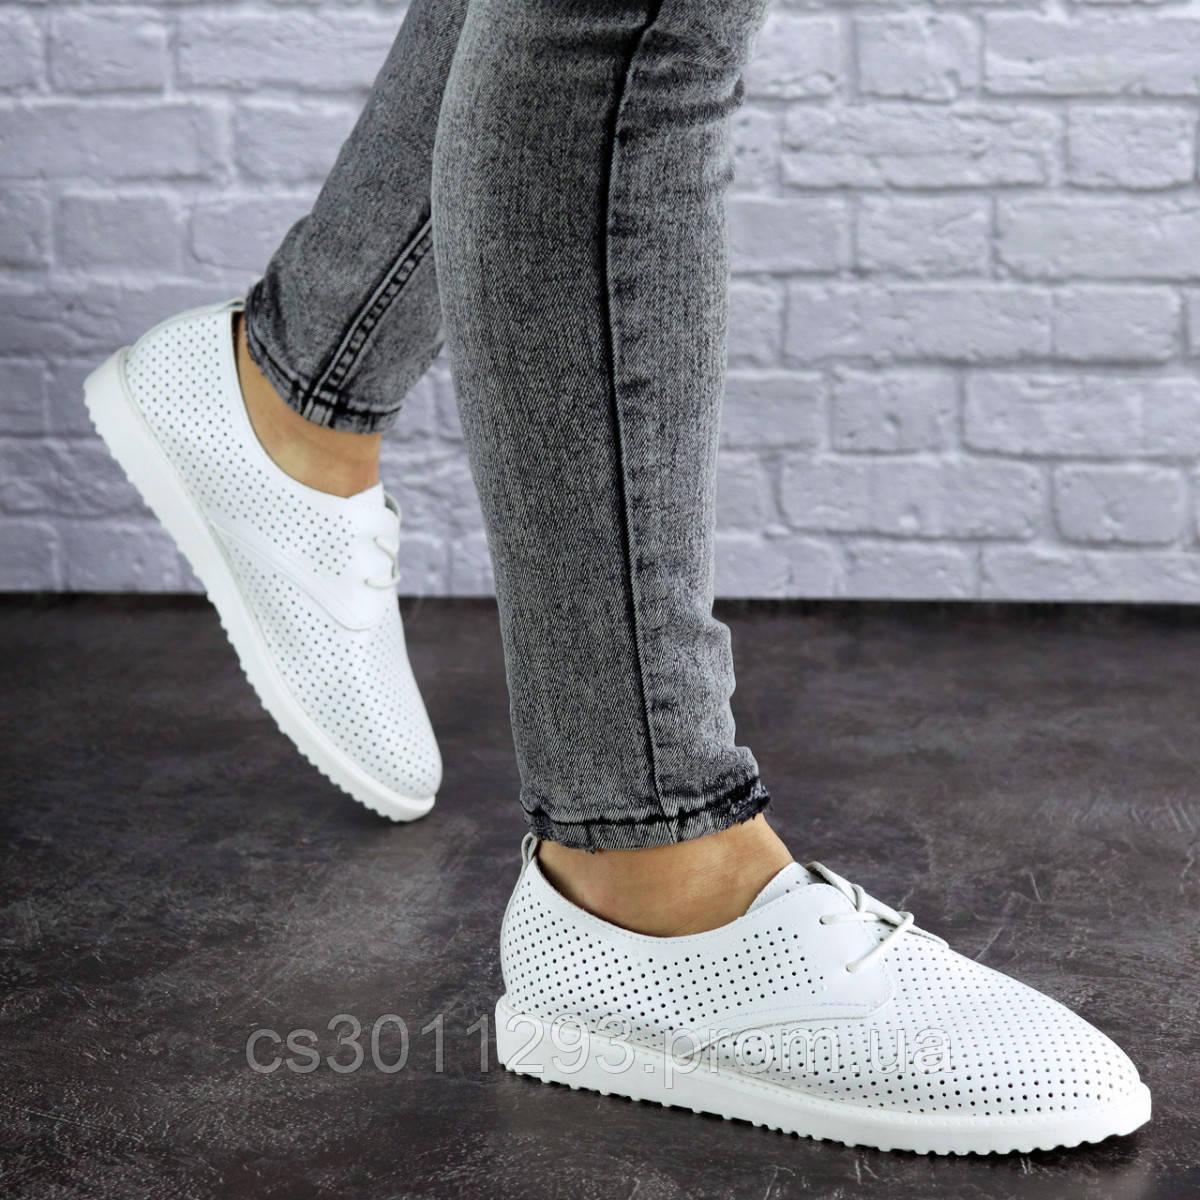 Женские белые туфли Twinkle 1784 (38 размер)